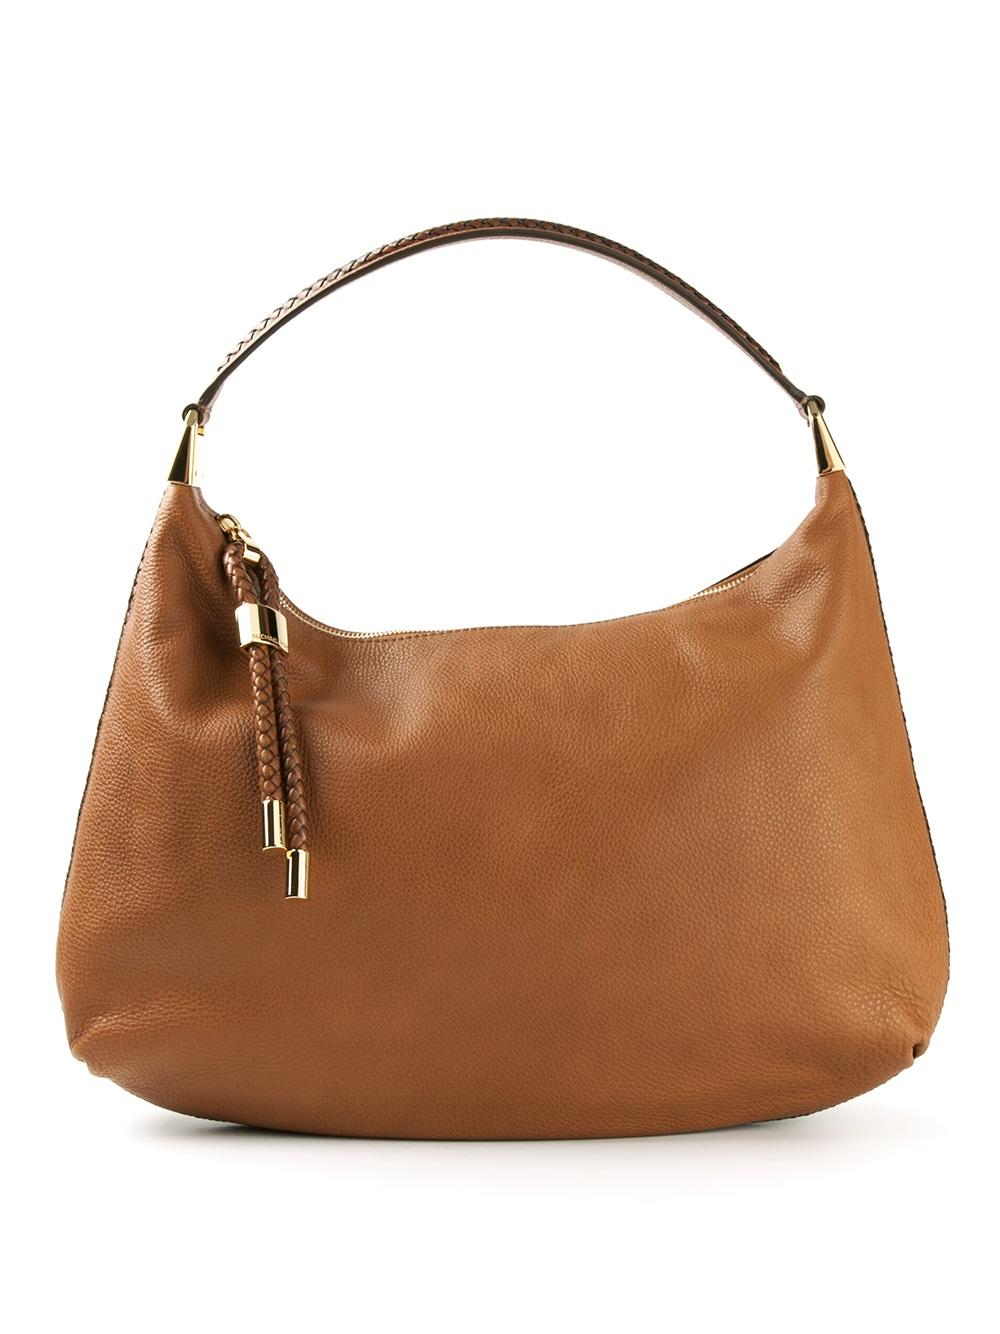 51615ed093e4 Michael Kors Skorpios Hobo Shoulder Bag in Brown - Lyst